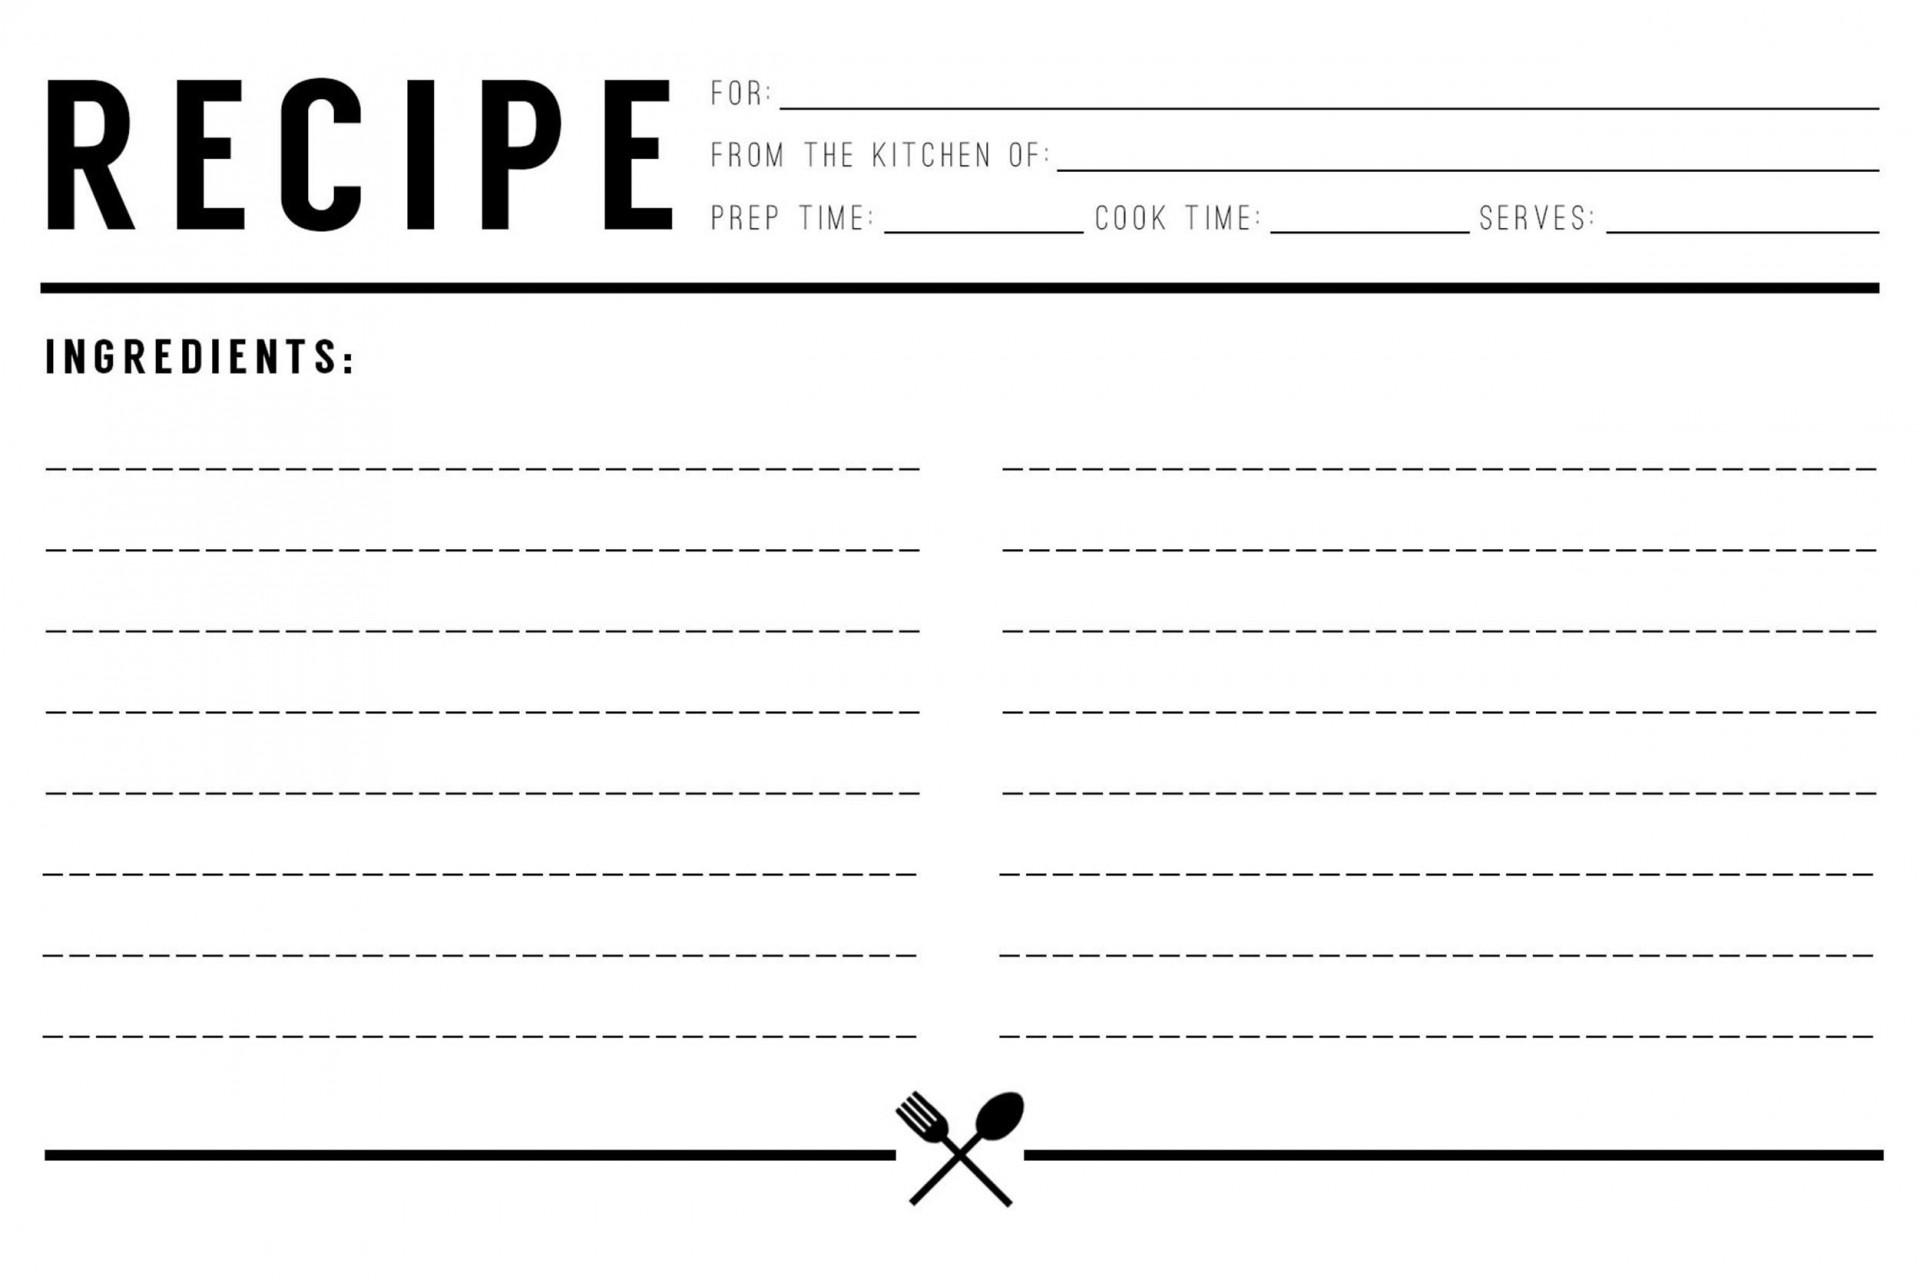 005 Sensational M Word Recipe Template Idea  Microsoft Card 2010 Full Page1920